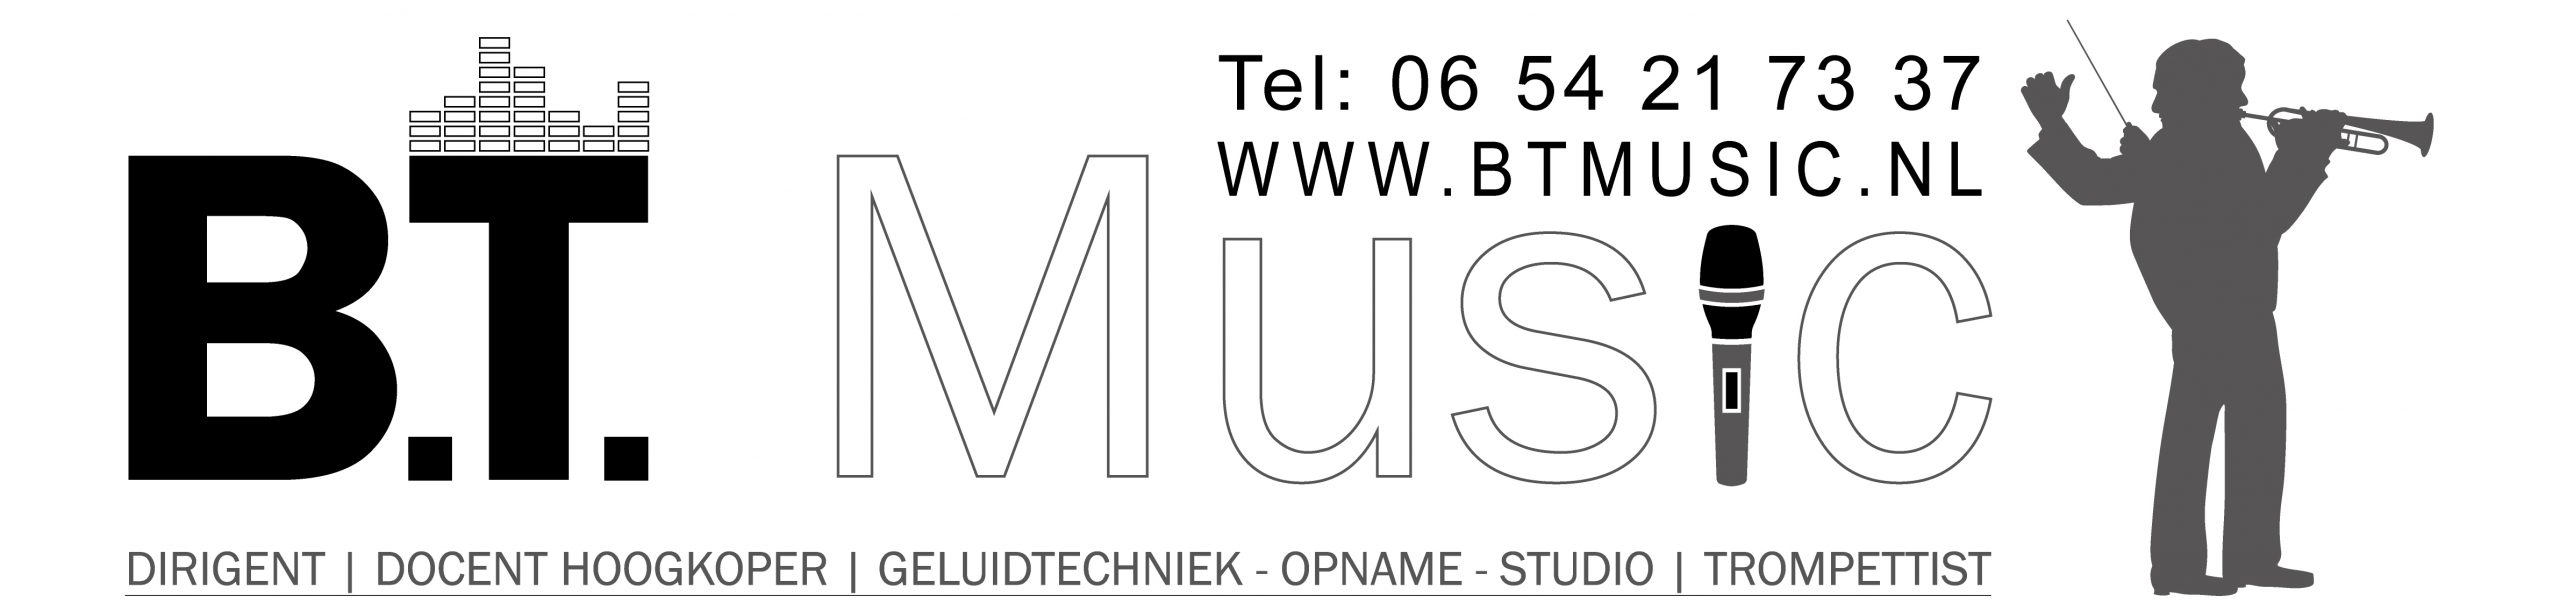 btmusic